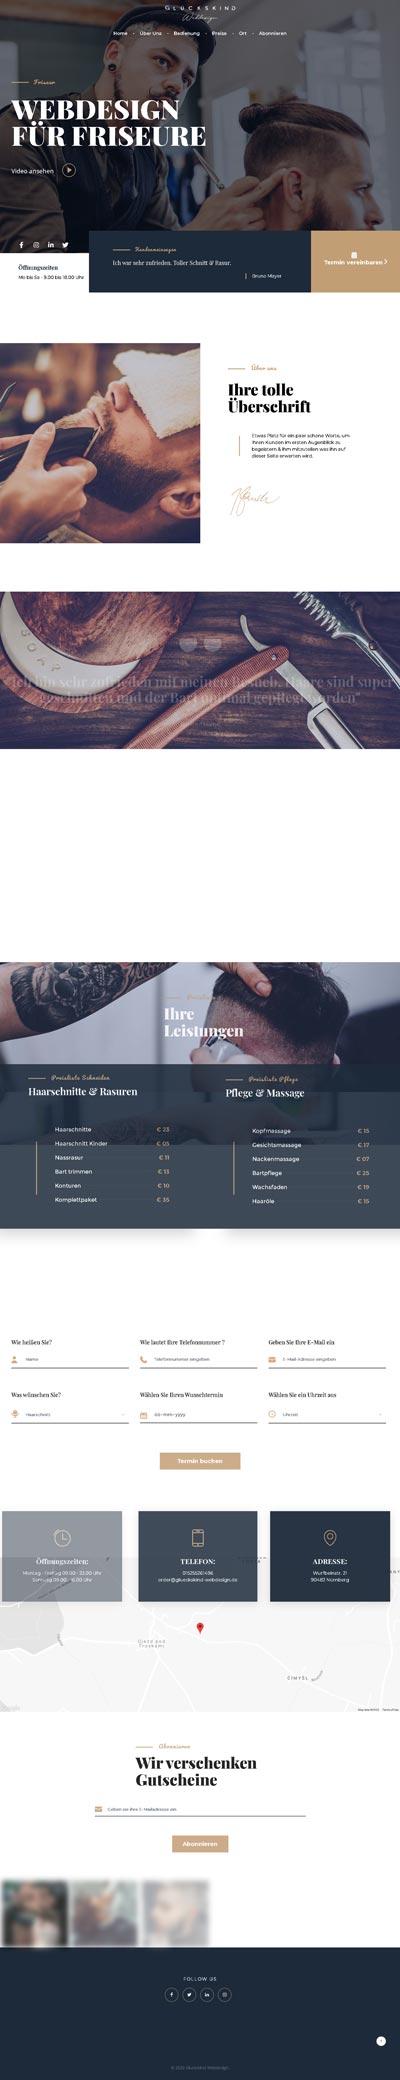 Friseur Fekkaii - Glückskind Webdesign Musterkatalog